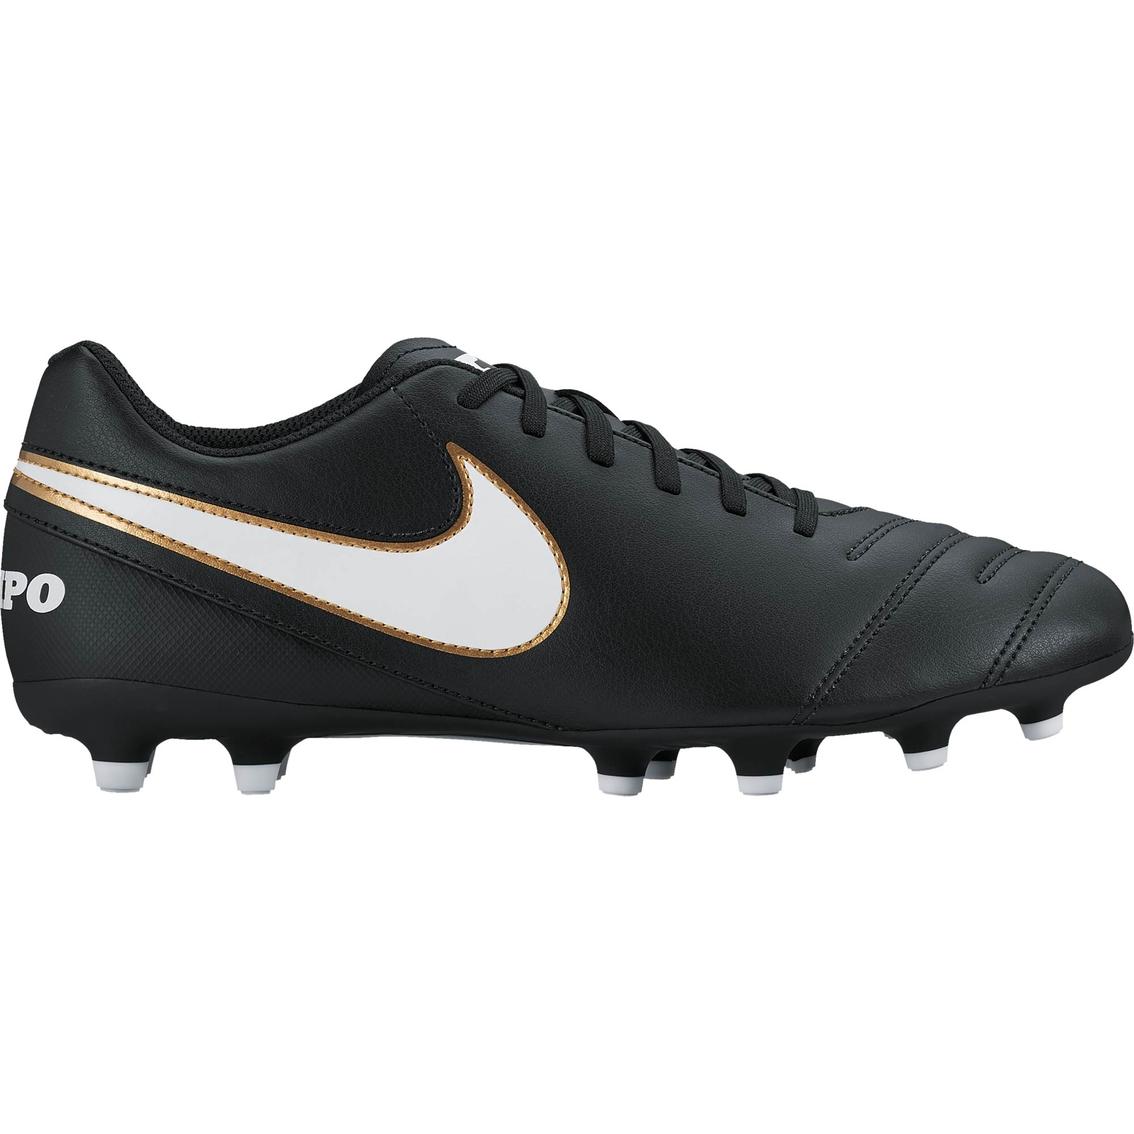 separation shoes 457e7 88fc7 Nike Men s Tiempo Rio III FG Soccer Cleats